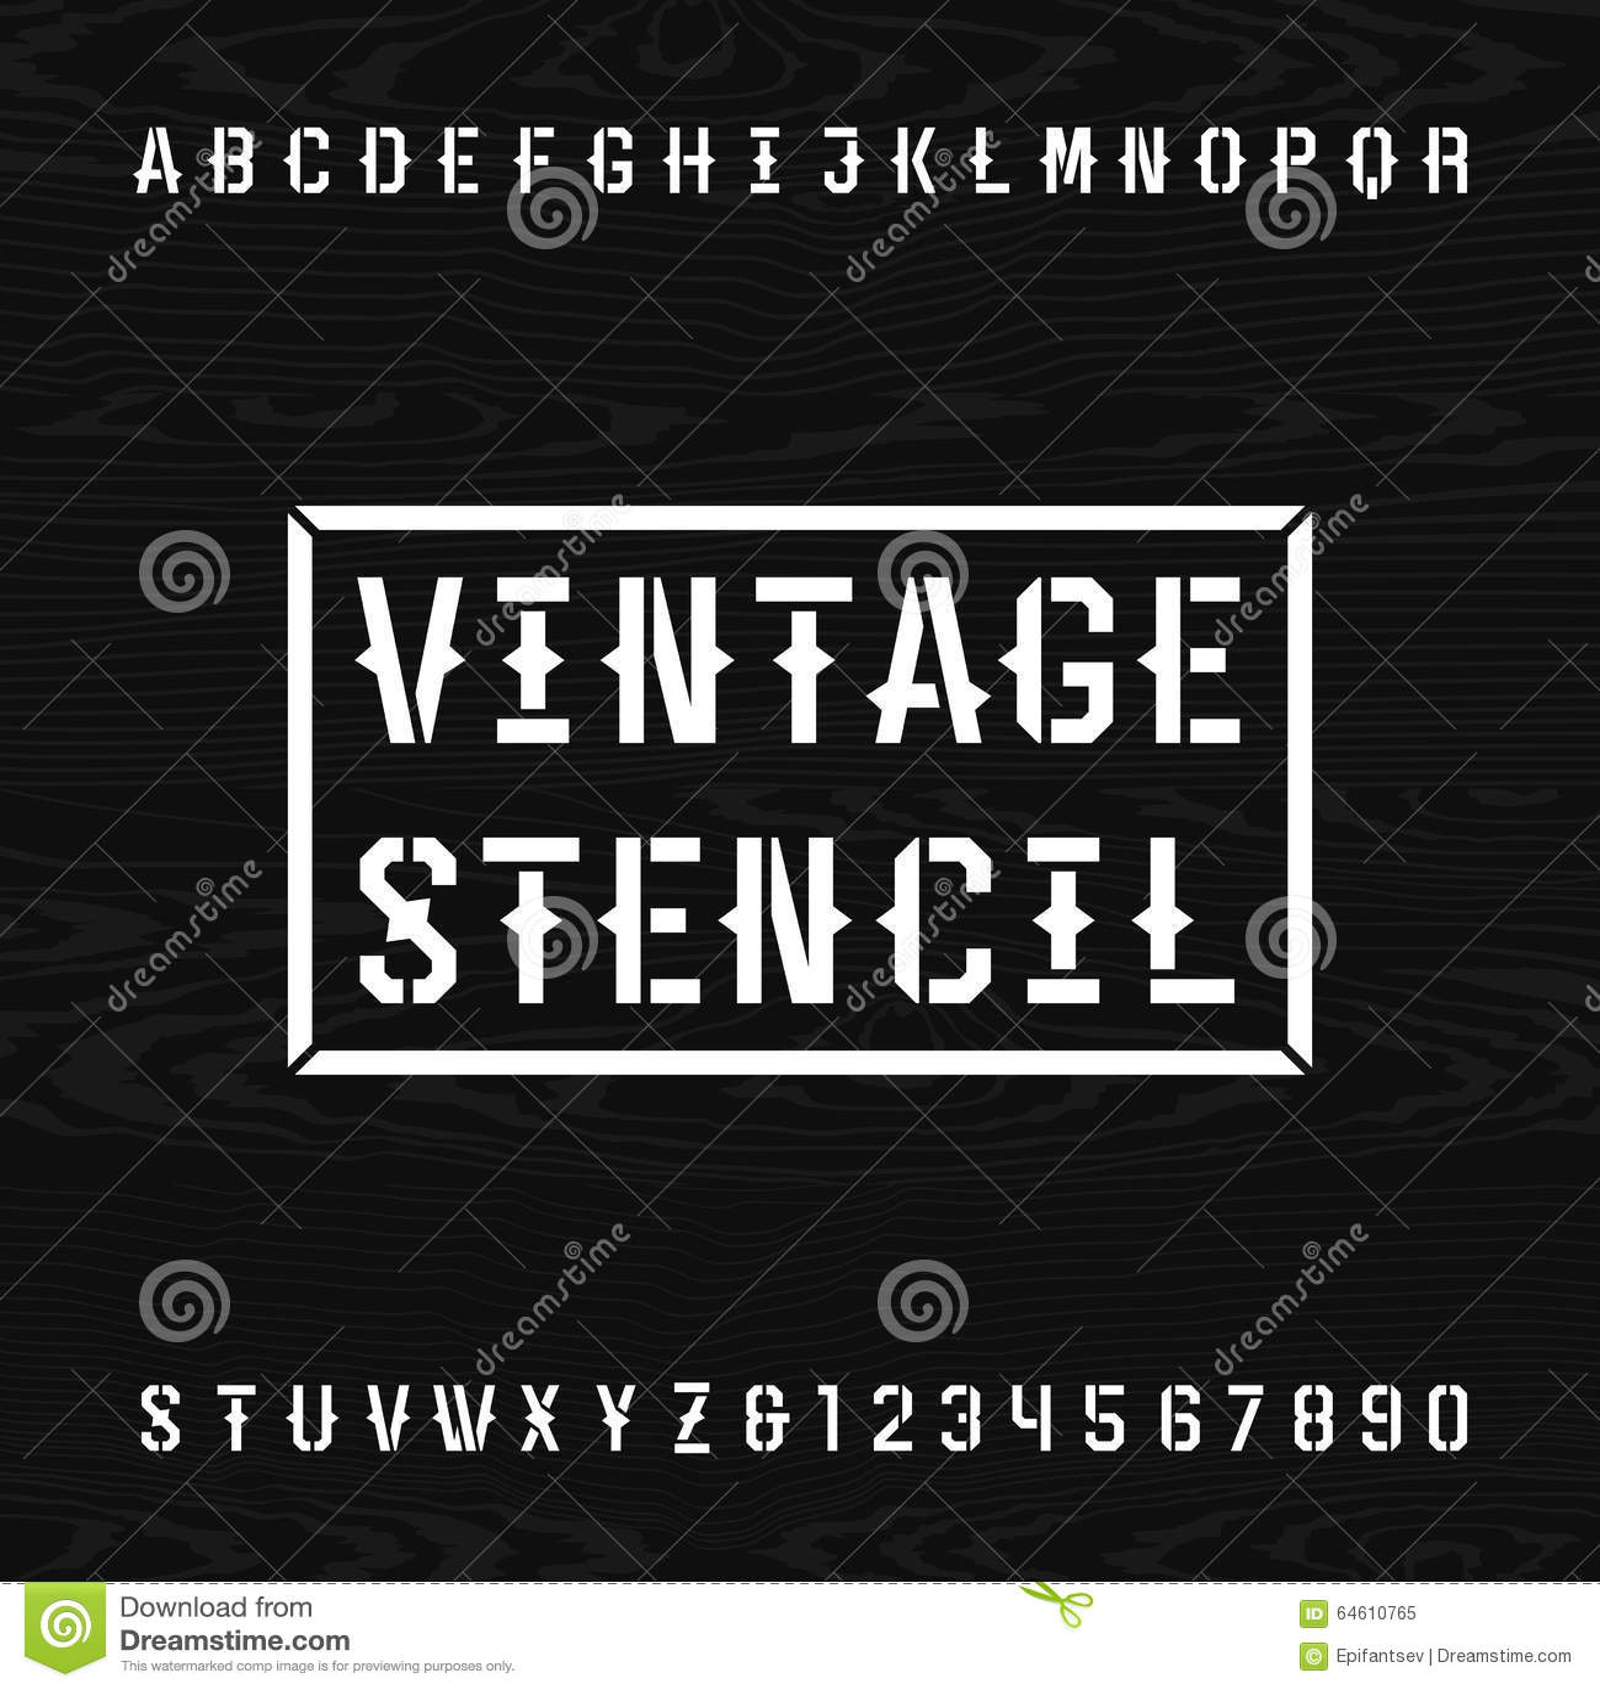 western style retro stencil alphabet vector font